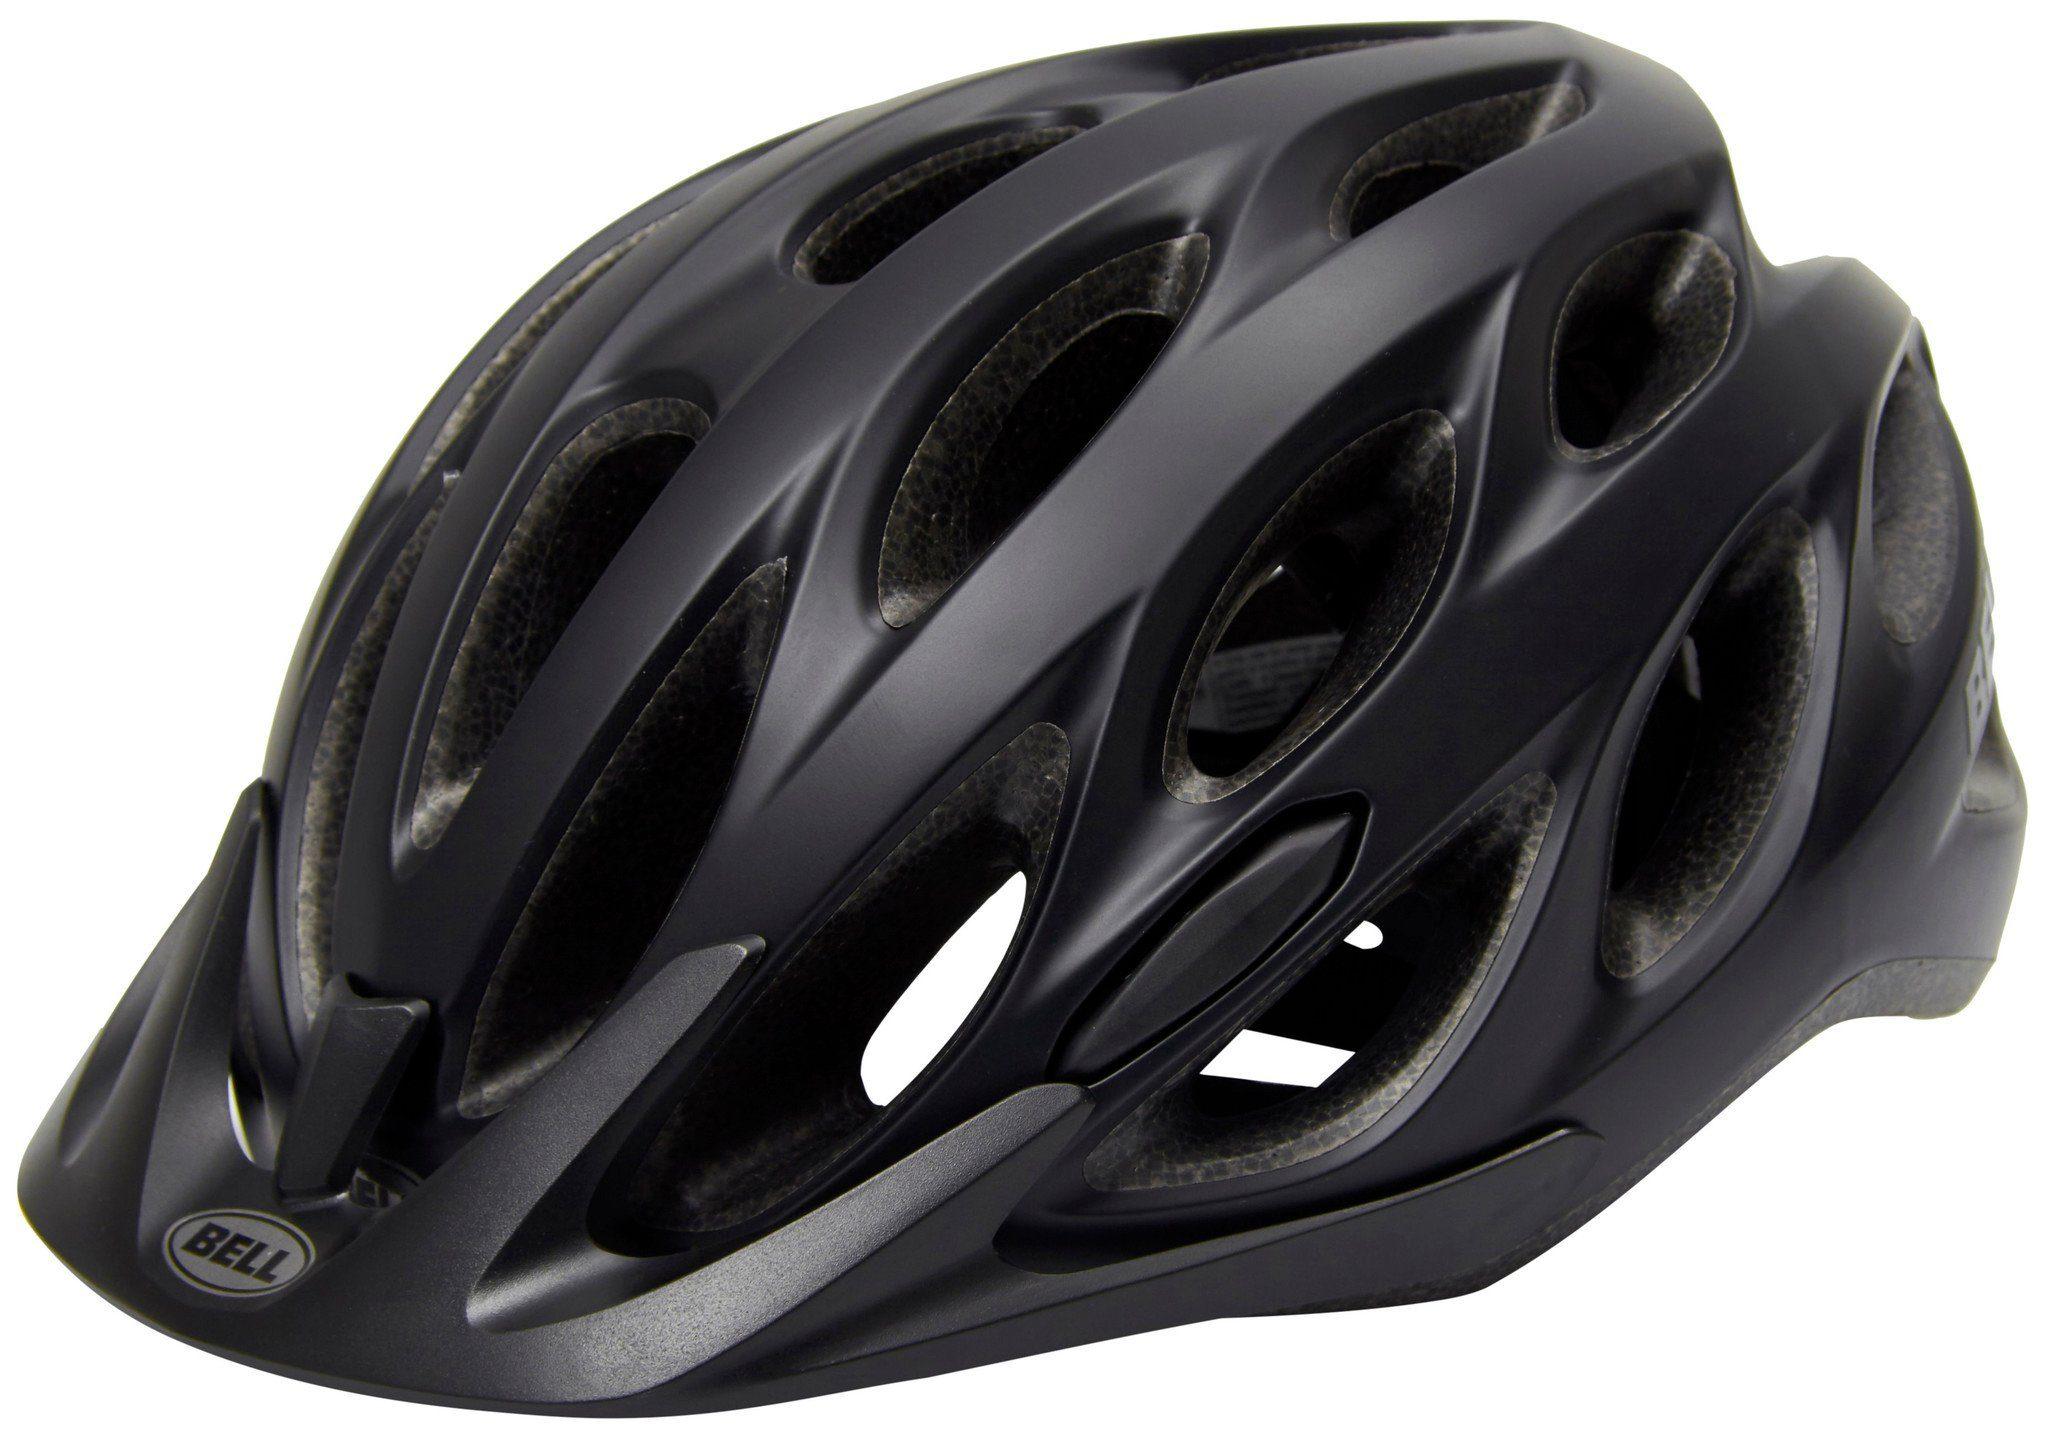 Bell Fahrradhelm »Tracker Lifestyle Helmet«